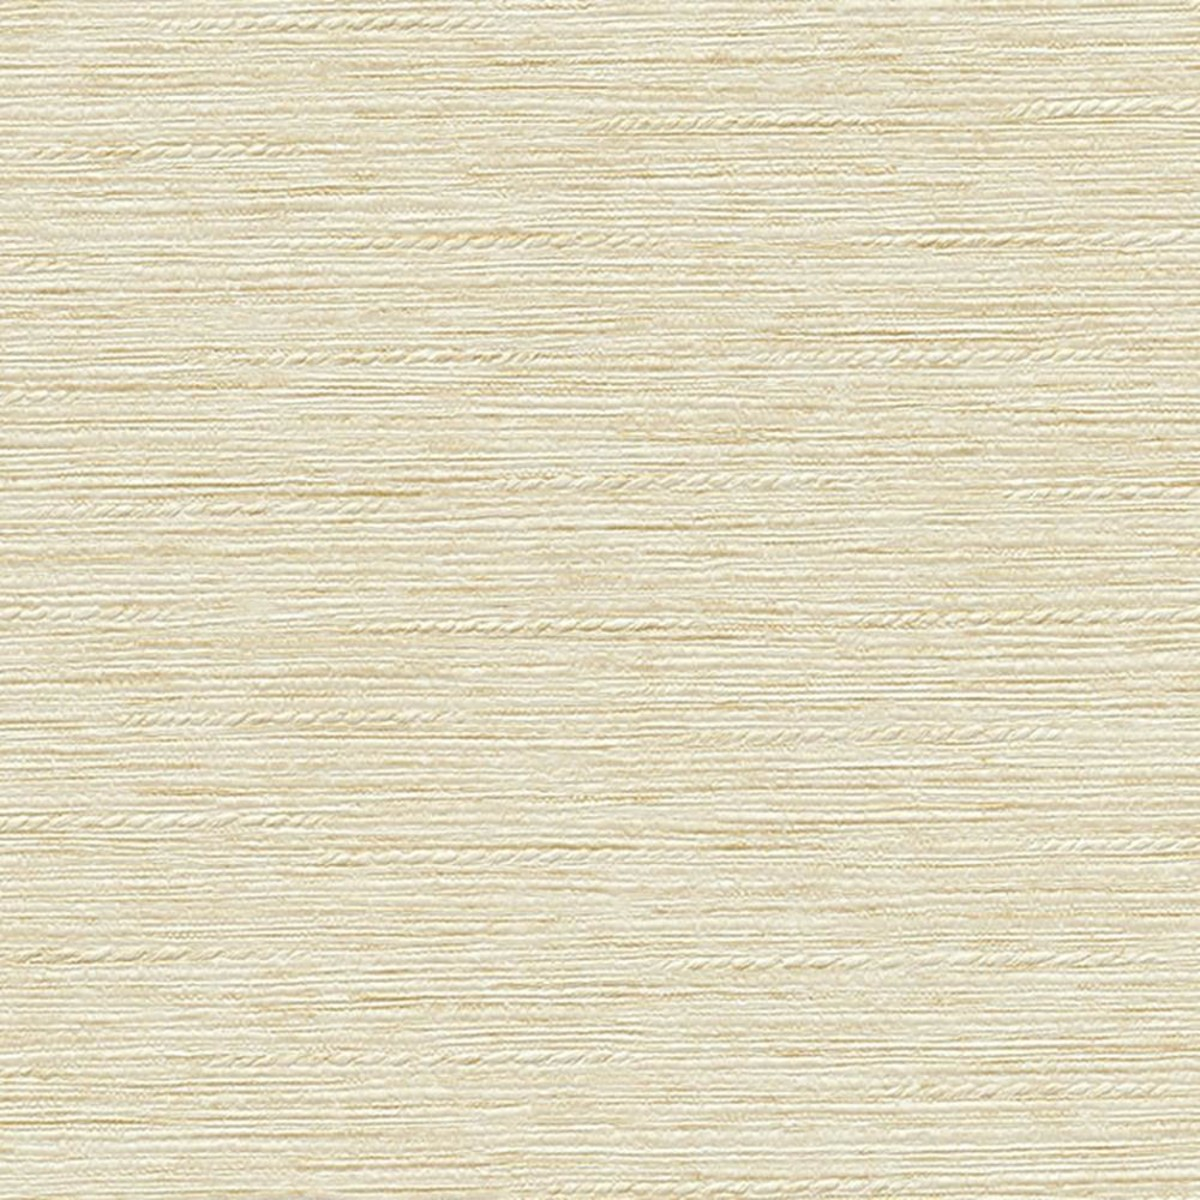 Обои виниловые Shinhan Wallcoverings бежевые 1.06 м 88277-2